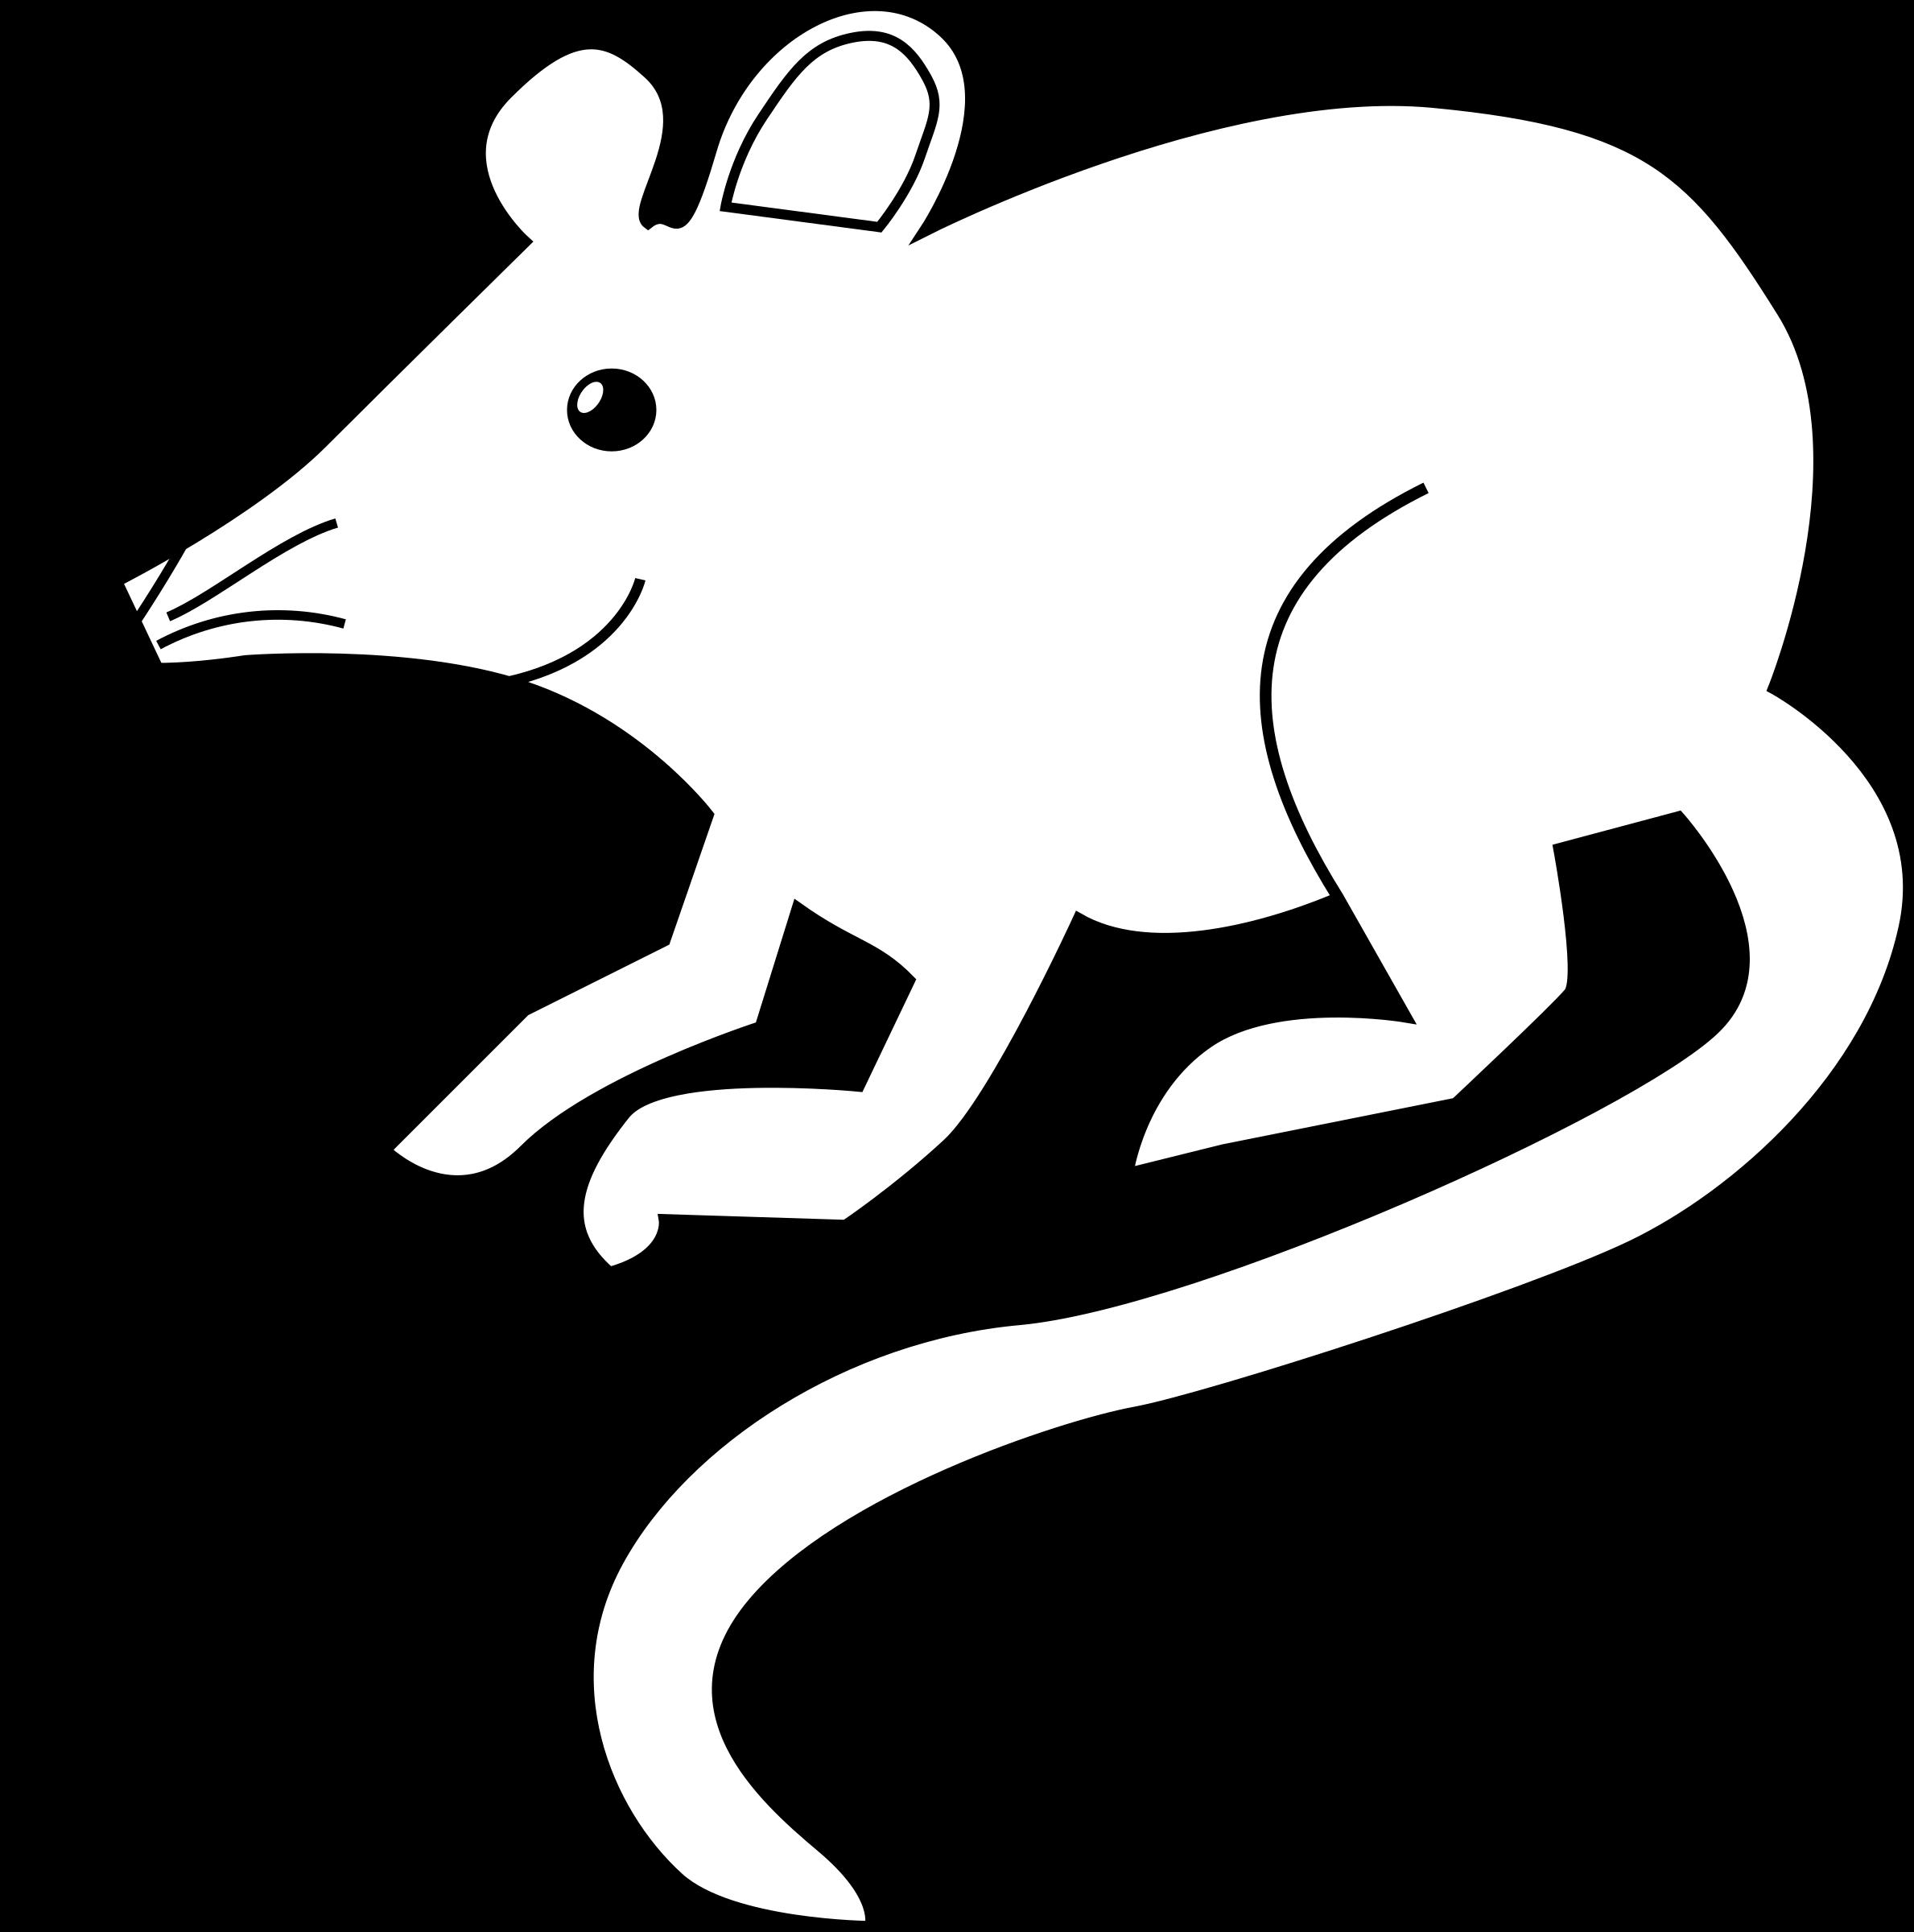 Clipart rat simple. Mouse big image png